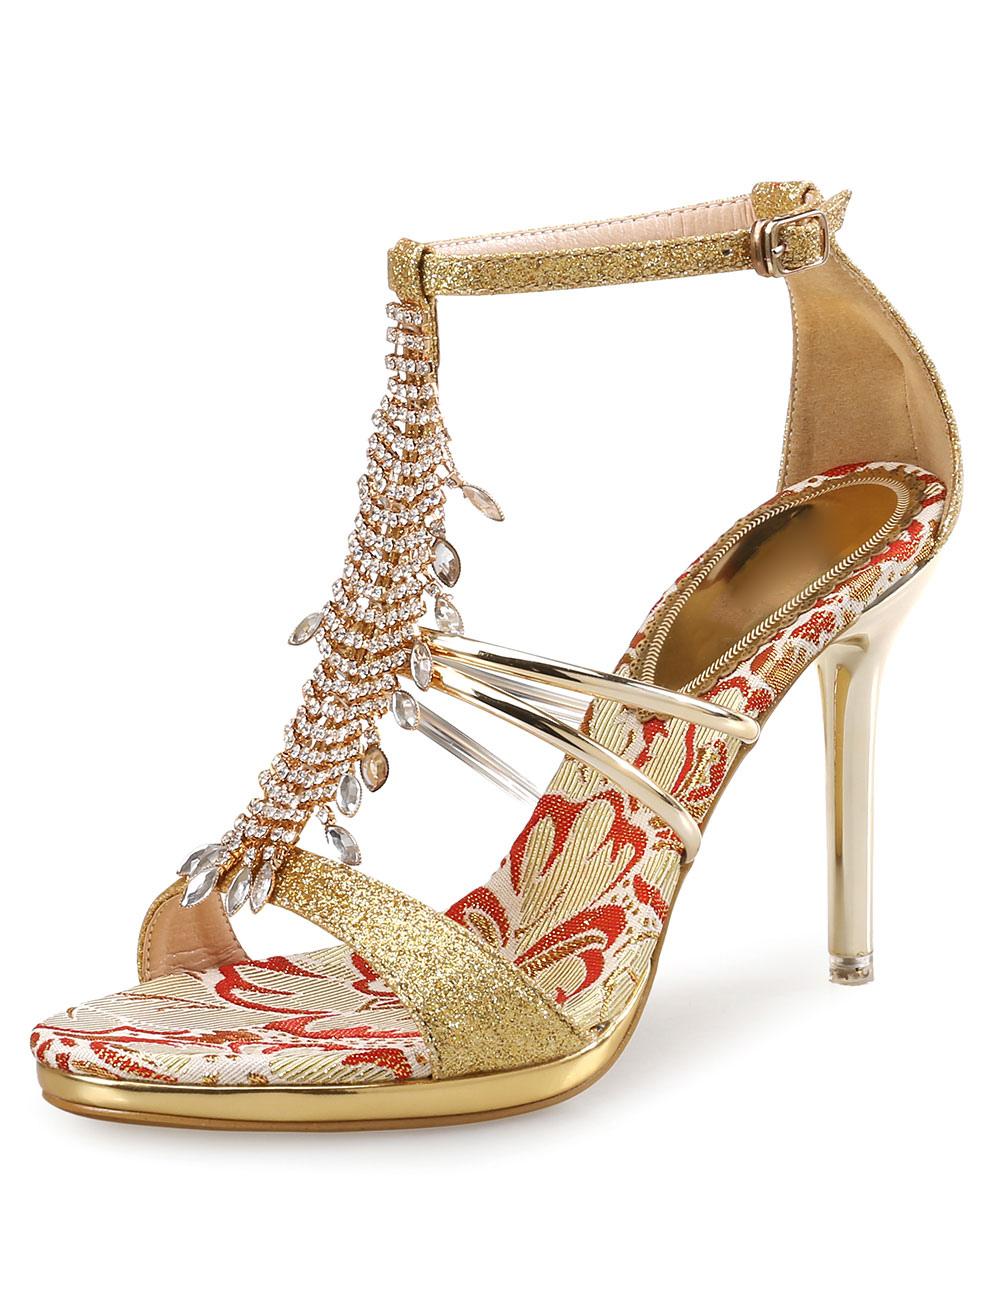 Glitter Dress Sandals High Heel Women's Gold Rhinestones Beaded T Type Bandage Ankle Strap Sandal Shoes